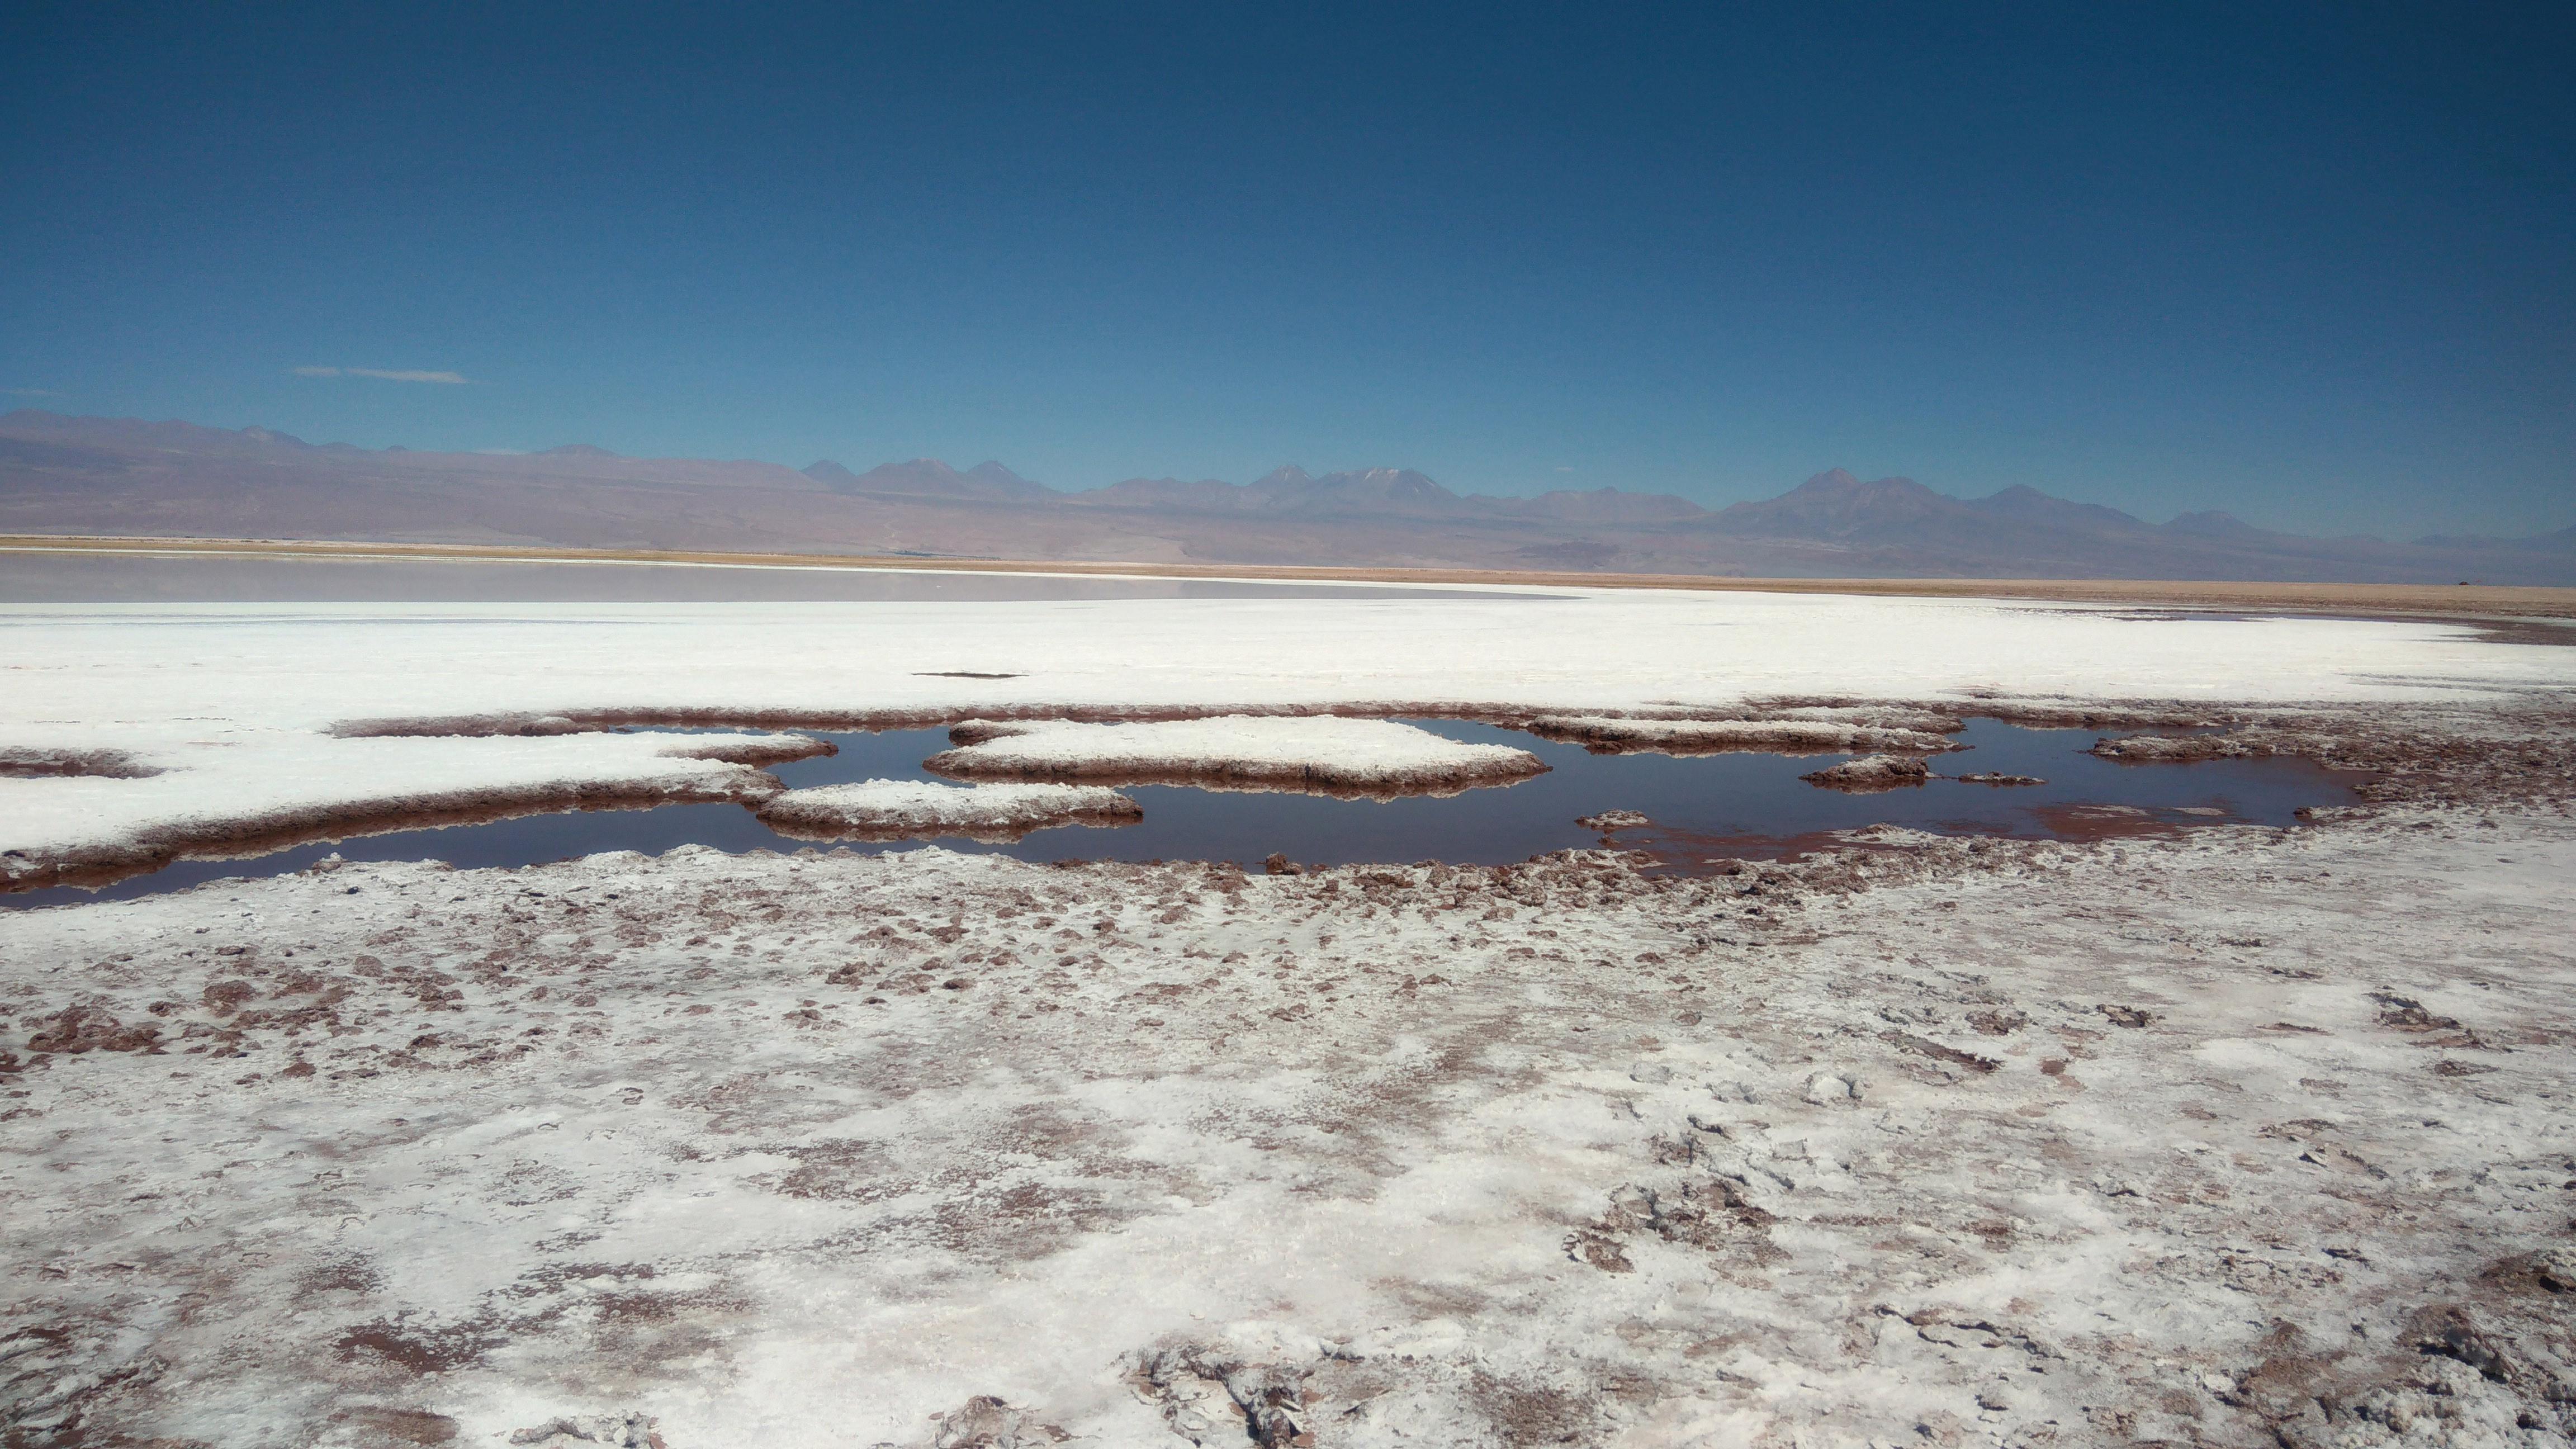 024 0912 Mirador - Salar de Atacama 140jpeg